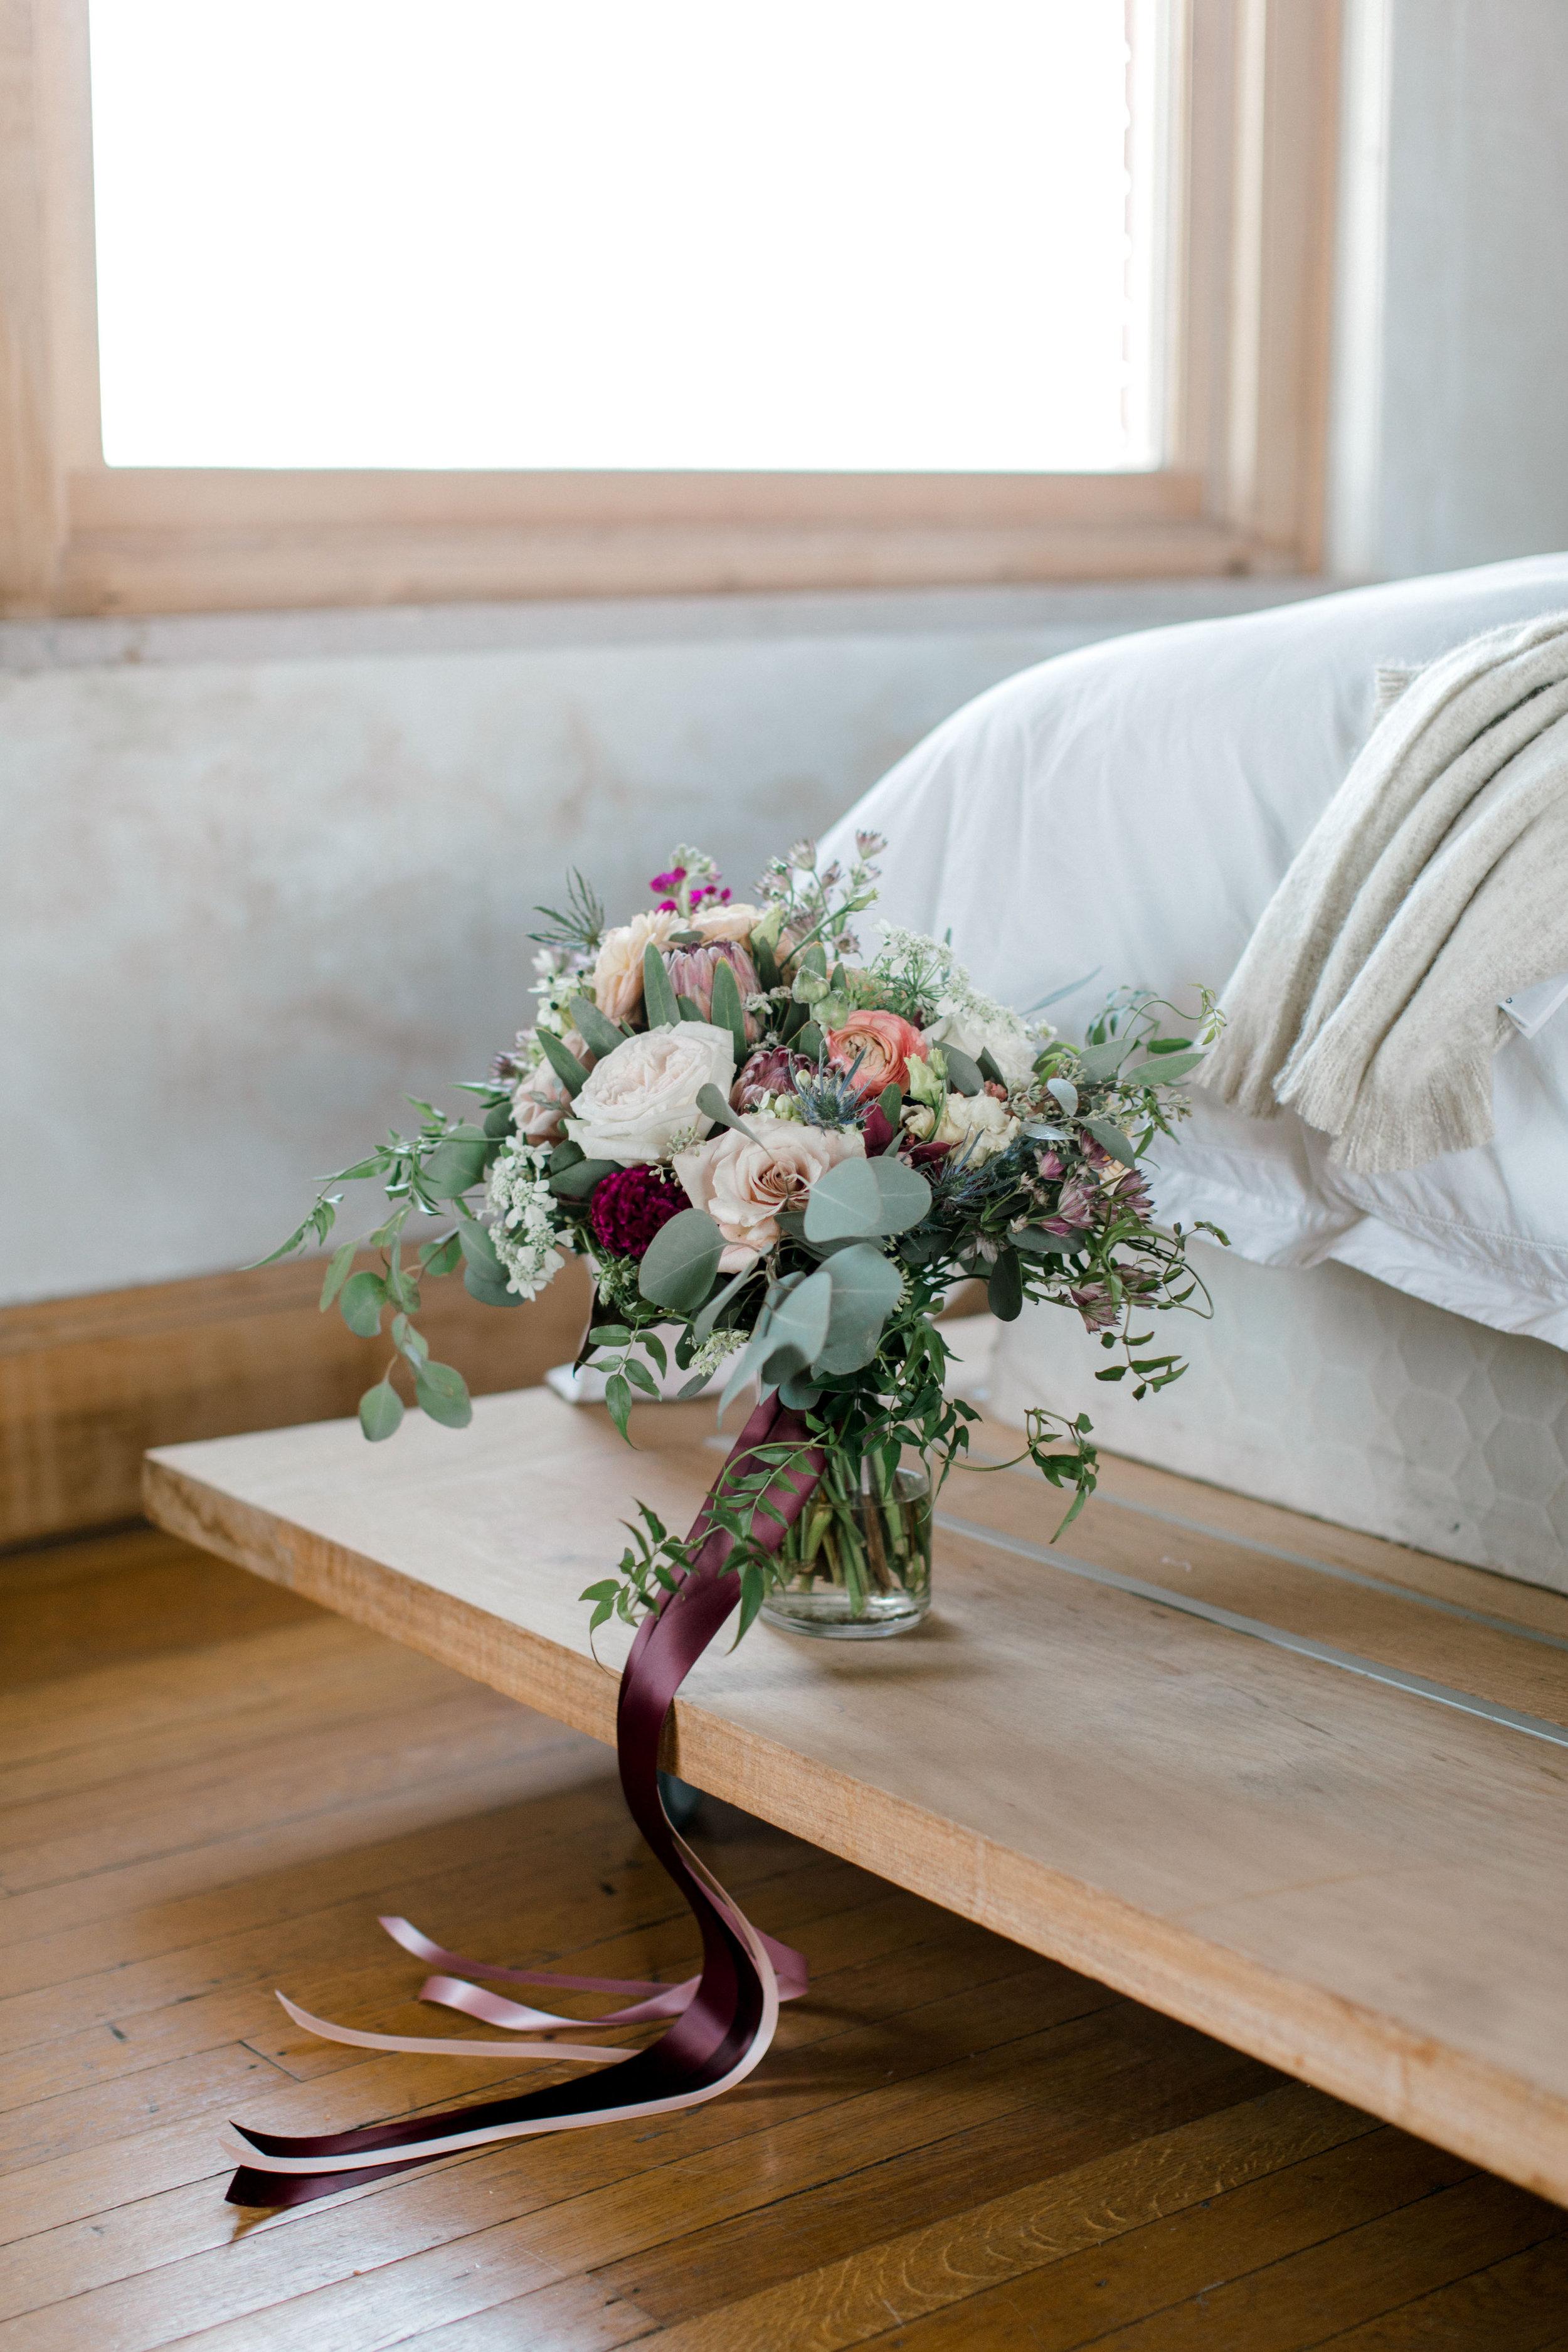 Ryan Alexa Married-Getting Ready First Look-0054.jpg